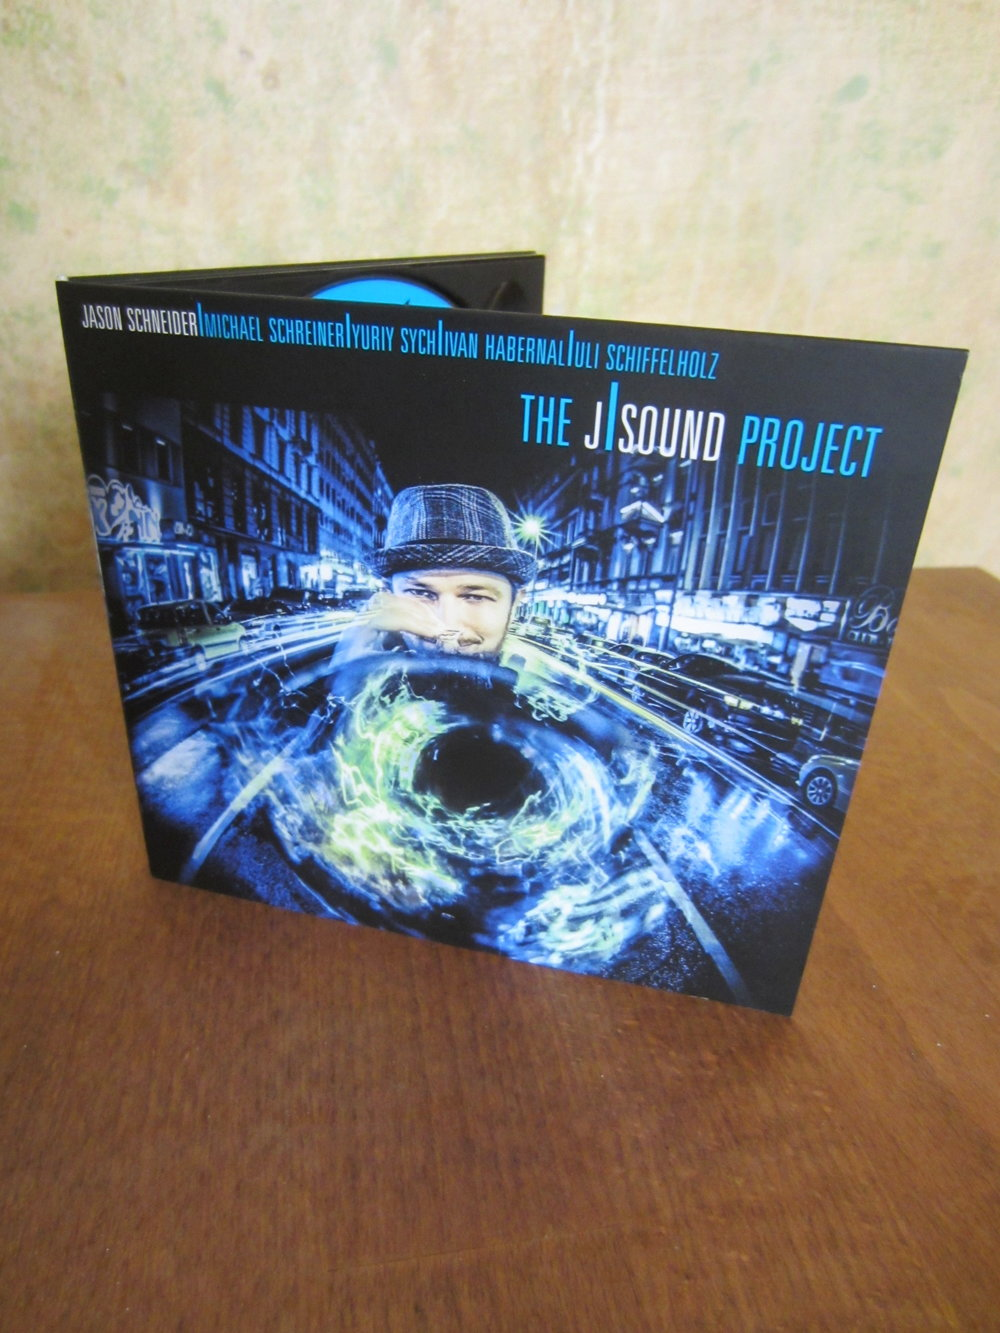 J-Sound CD.JPG